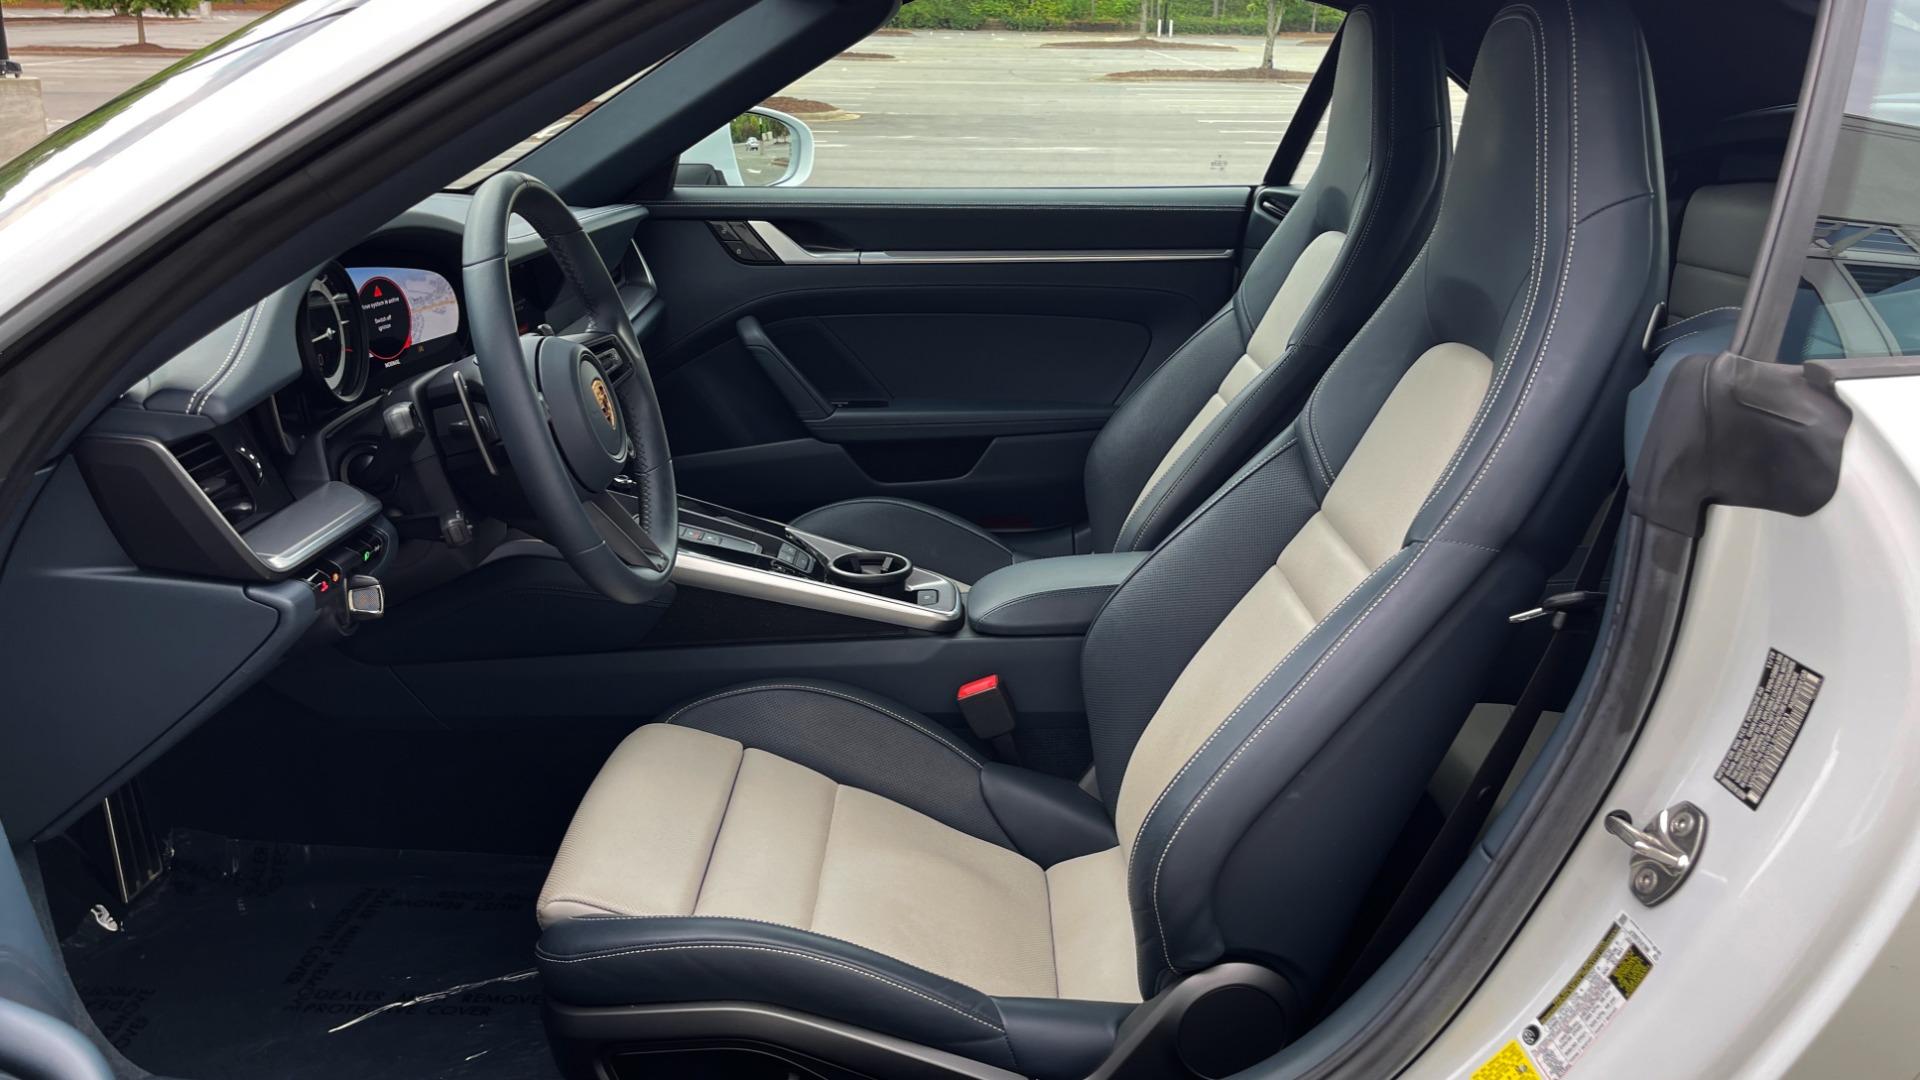 Used 2020 Porsche 911 CARRERA 4S CABRIOLET PREMIUM SPORT PKG / NAV / BOSE / LIGHT DESIGN PKG for sale $167,595 at Formula Imports in Charlotte NC 28227 45